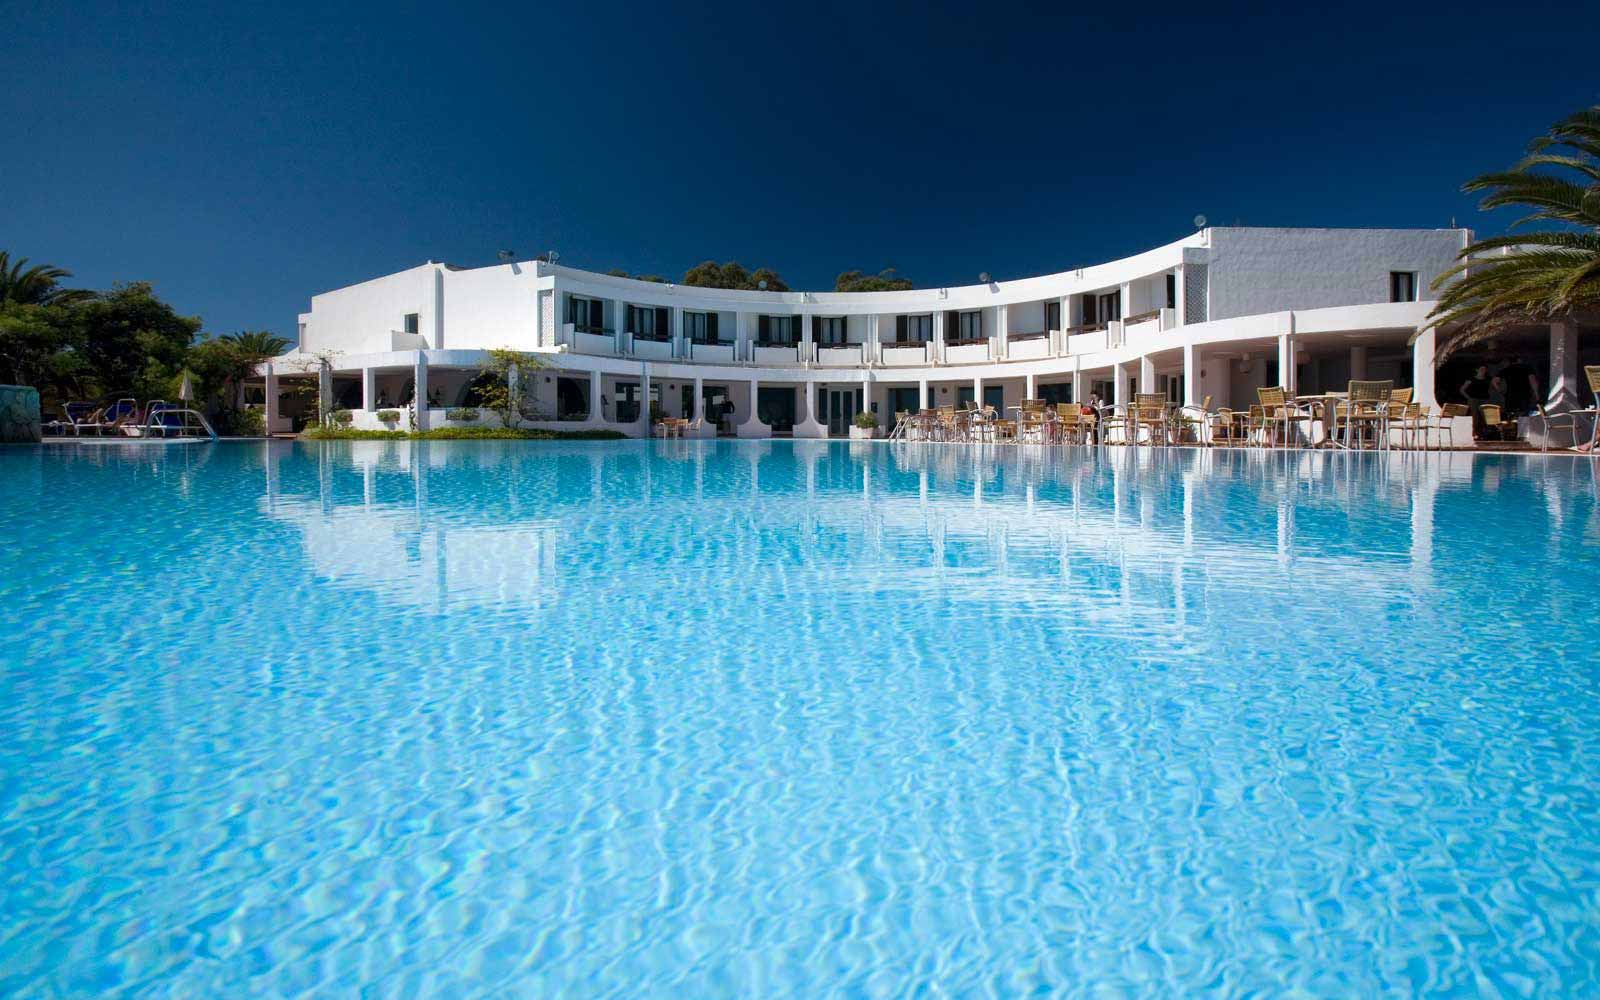 Hotel Flamingo Santa Margherita Di Pula Sardinia 4 Beach Holidays